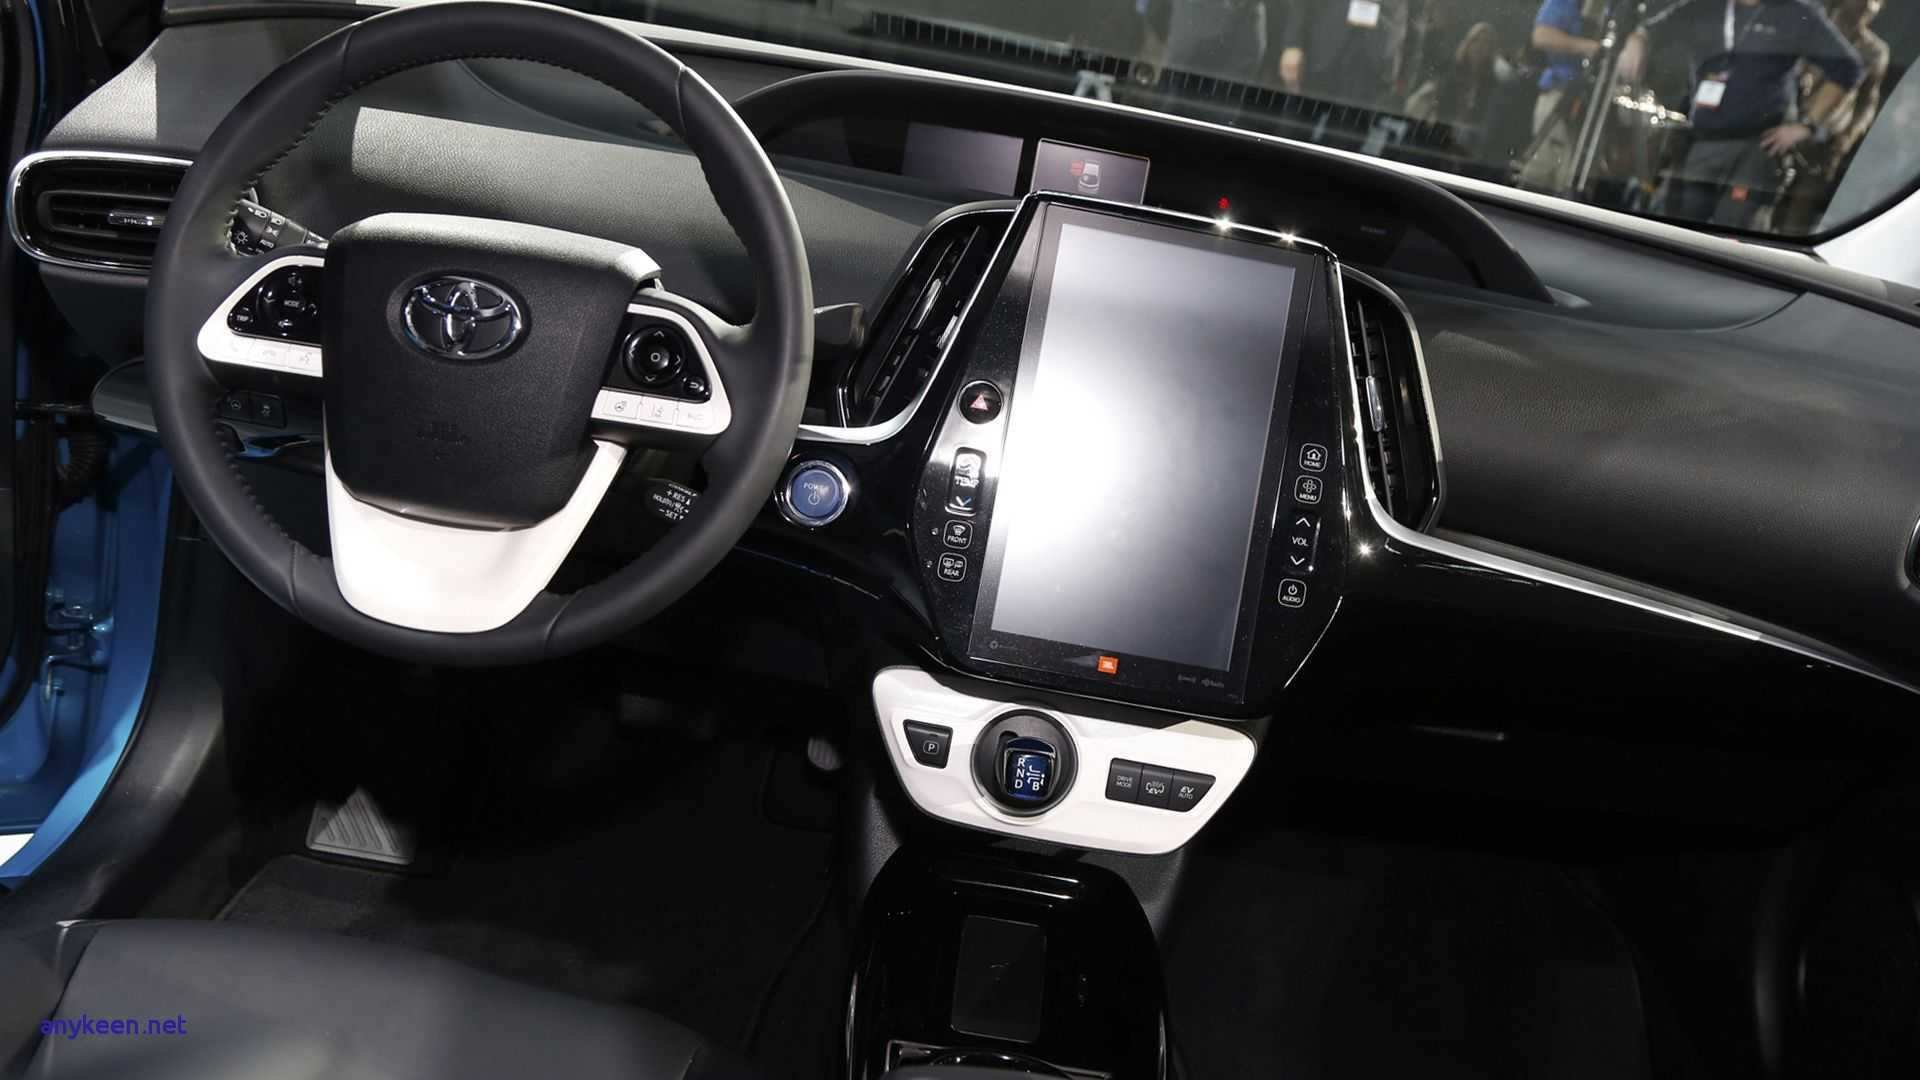 46 Great 2019 Toyota Prius Prime Release Date Rumors with 2019 Toyota Prius Prime Release Date